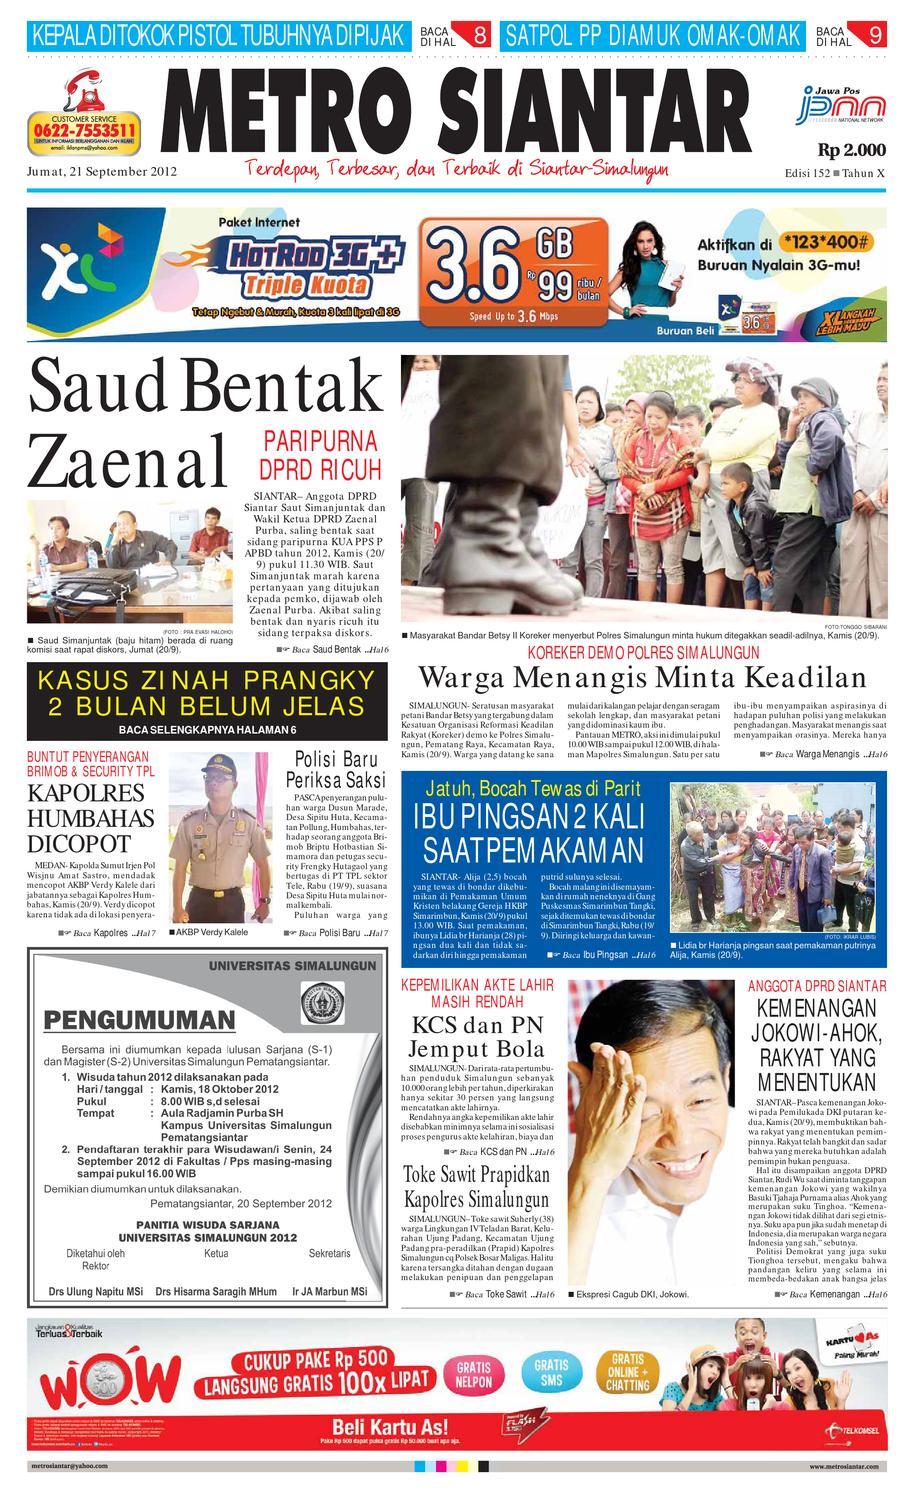 Epaper Metro Siantar By Issuu Tcash Vaganza 37 Kran Tembok Kuningan Tr 5j F